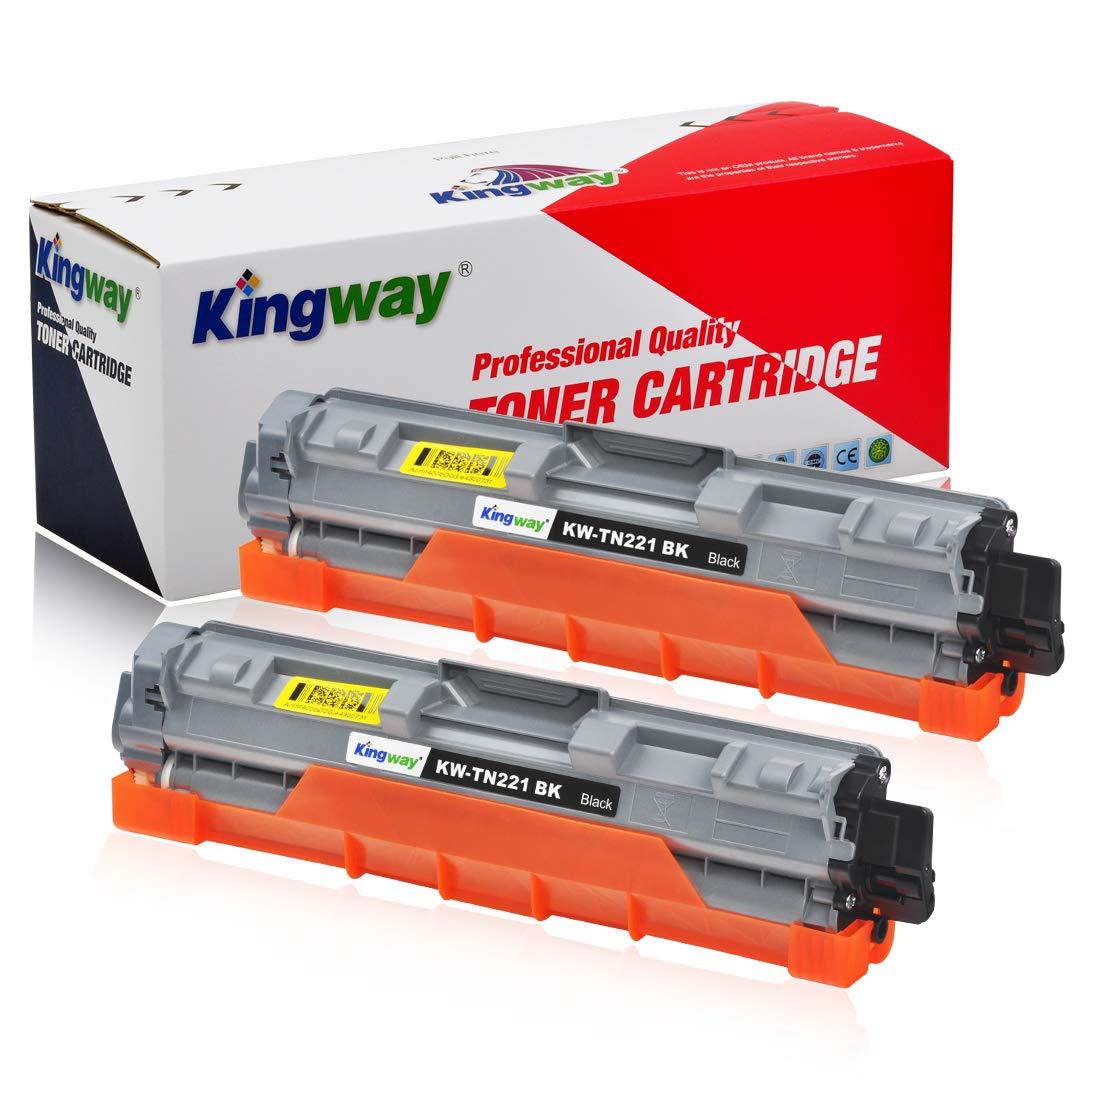 Kingway Compatible Toner Cartridge Replacement TN221 TN225 Work MFC-9130CW HL-3170CDW MFC-9330CDW HL-3140CW MFC-9340CDW HL-3180CDW HL-3150CDN Laser Printer 2 Pack (Black)